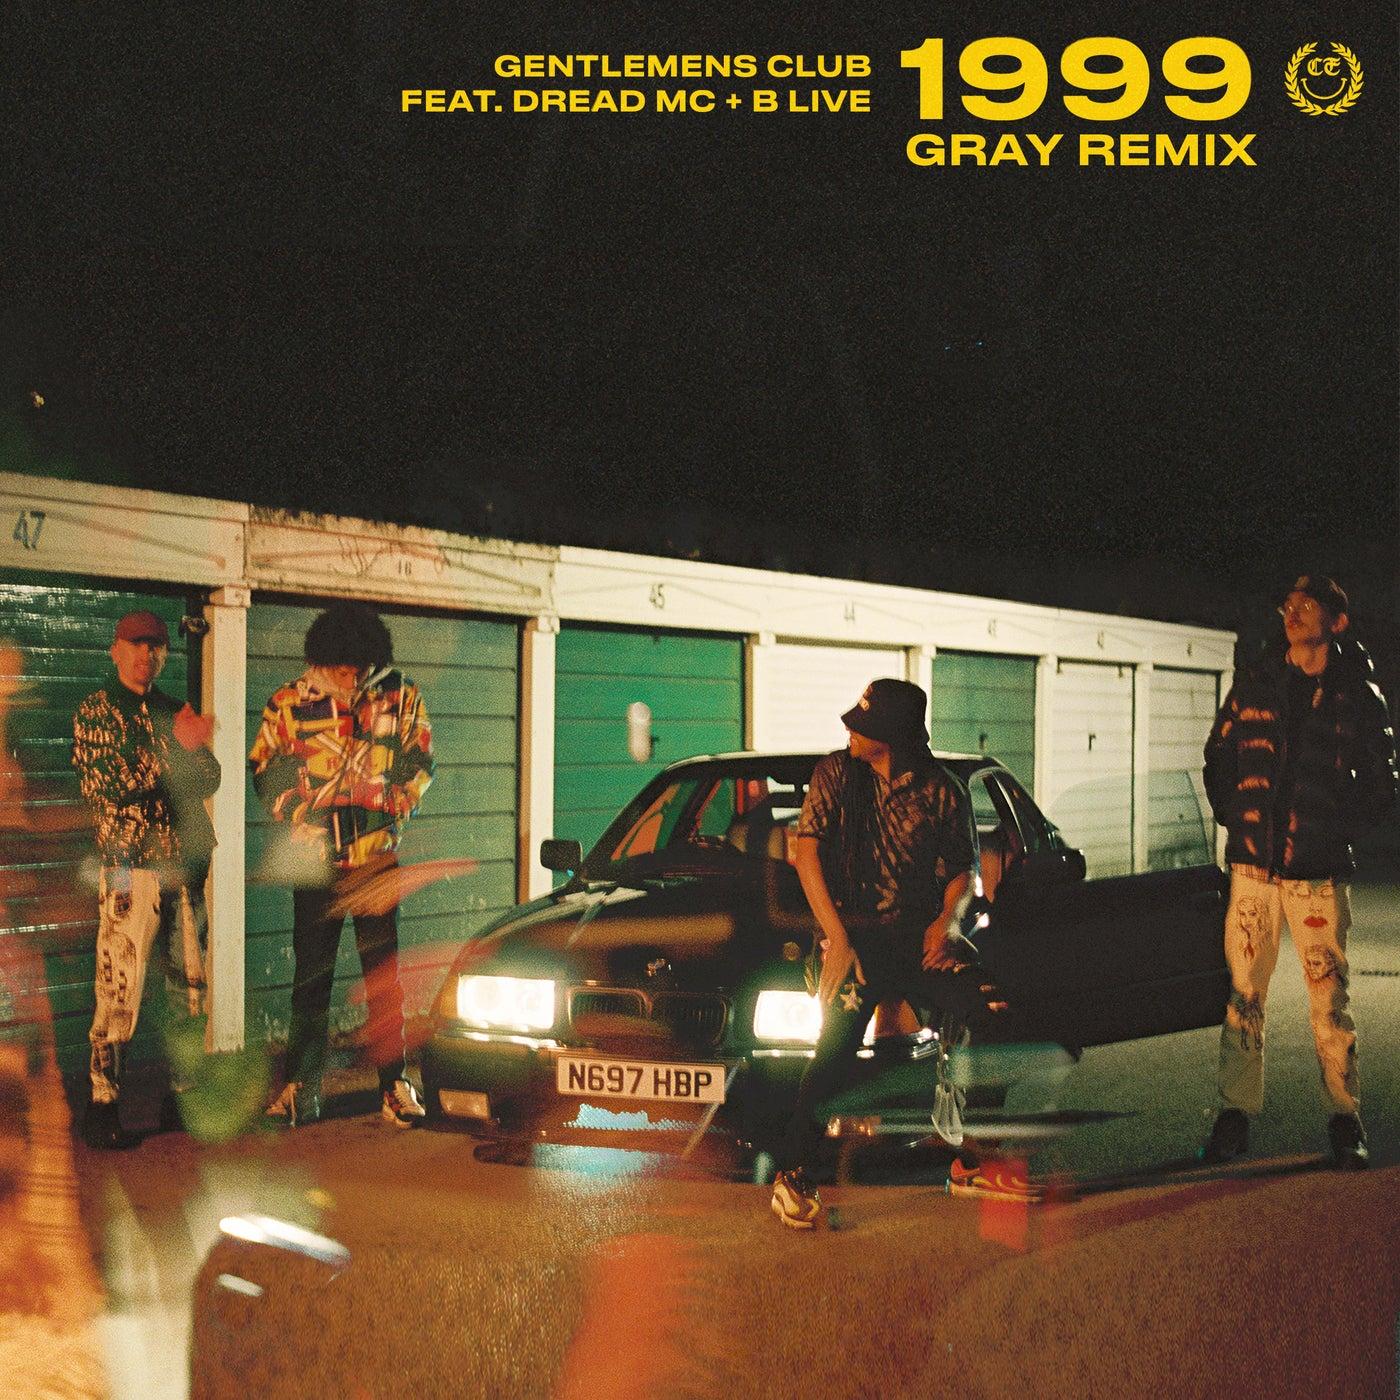 1999 (Gray Remix)